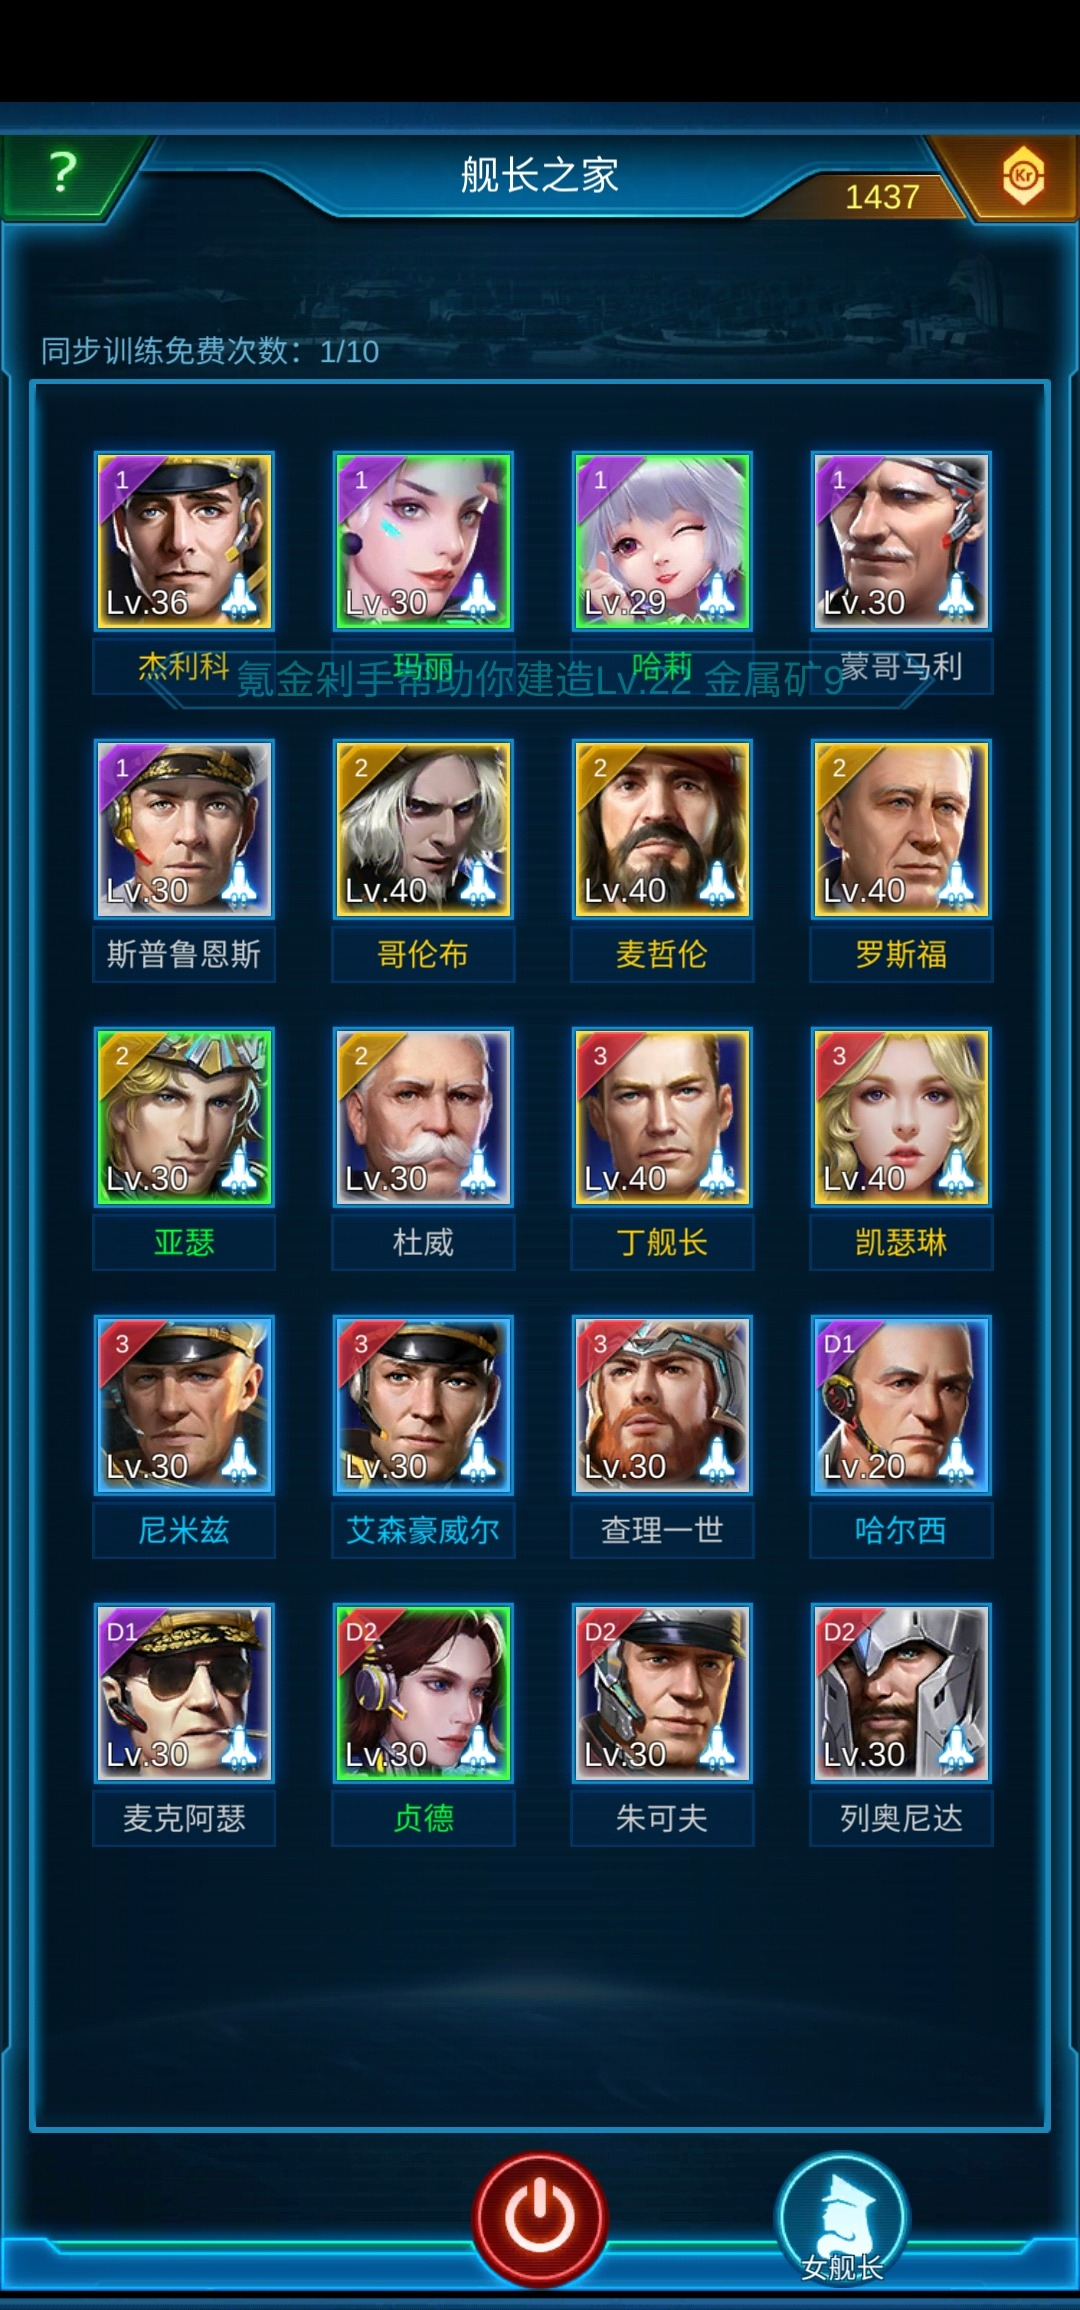 Screenshot_20200601_131157_com.jedigames.p16s.huawei.jpg